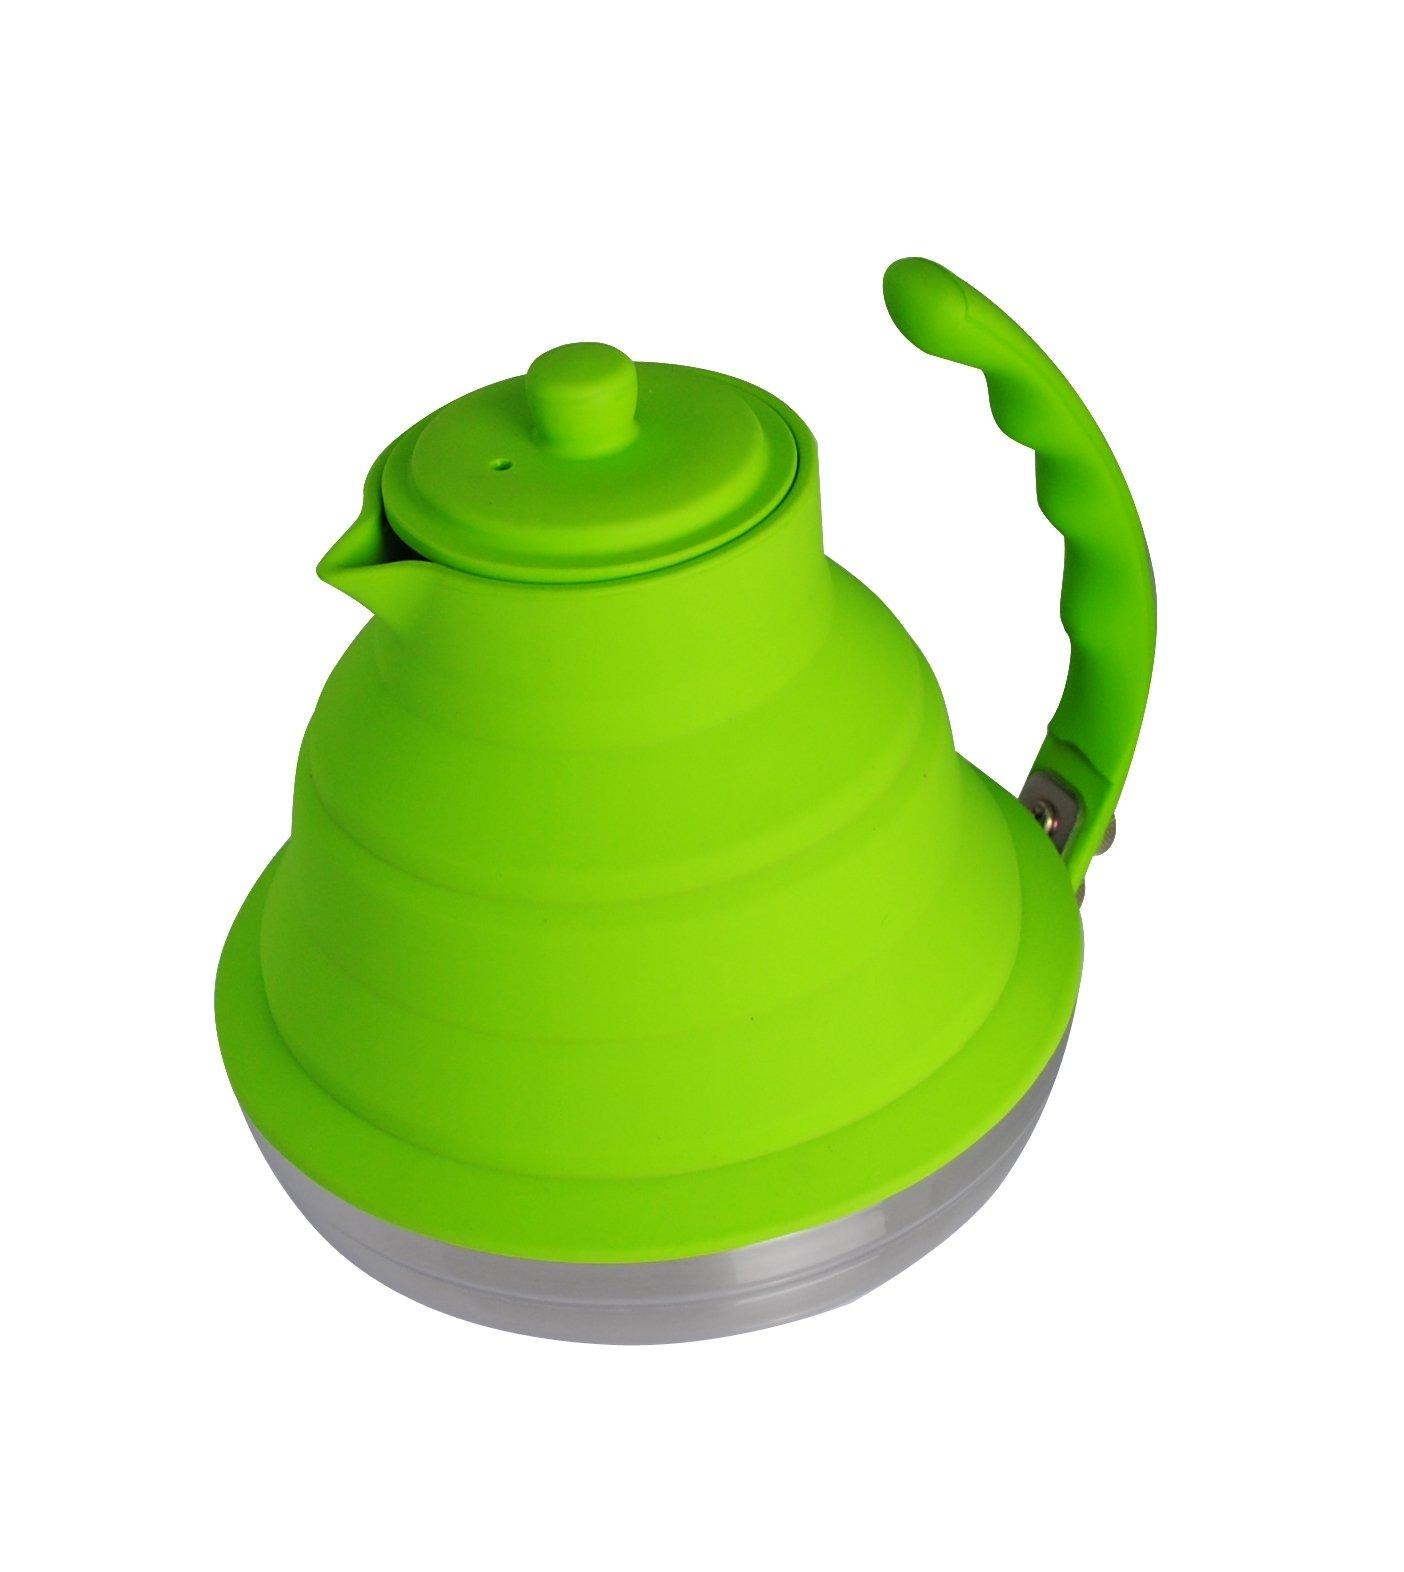 Better Houseware Collapsible Tea Kettle, Lime Green